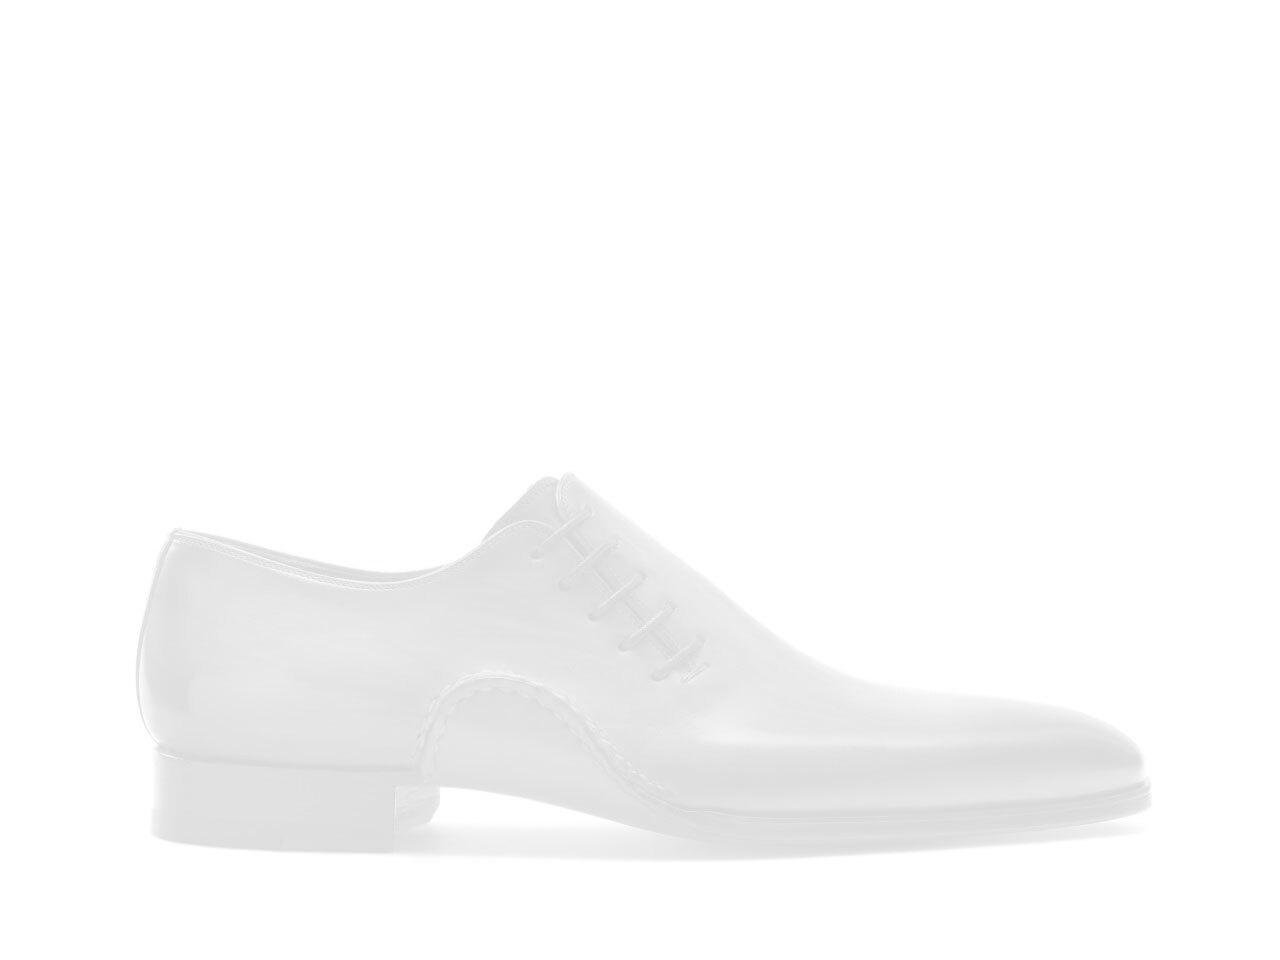 Pair of the Magnanni Cambados Cuero Men's Derby Shoes